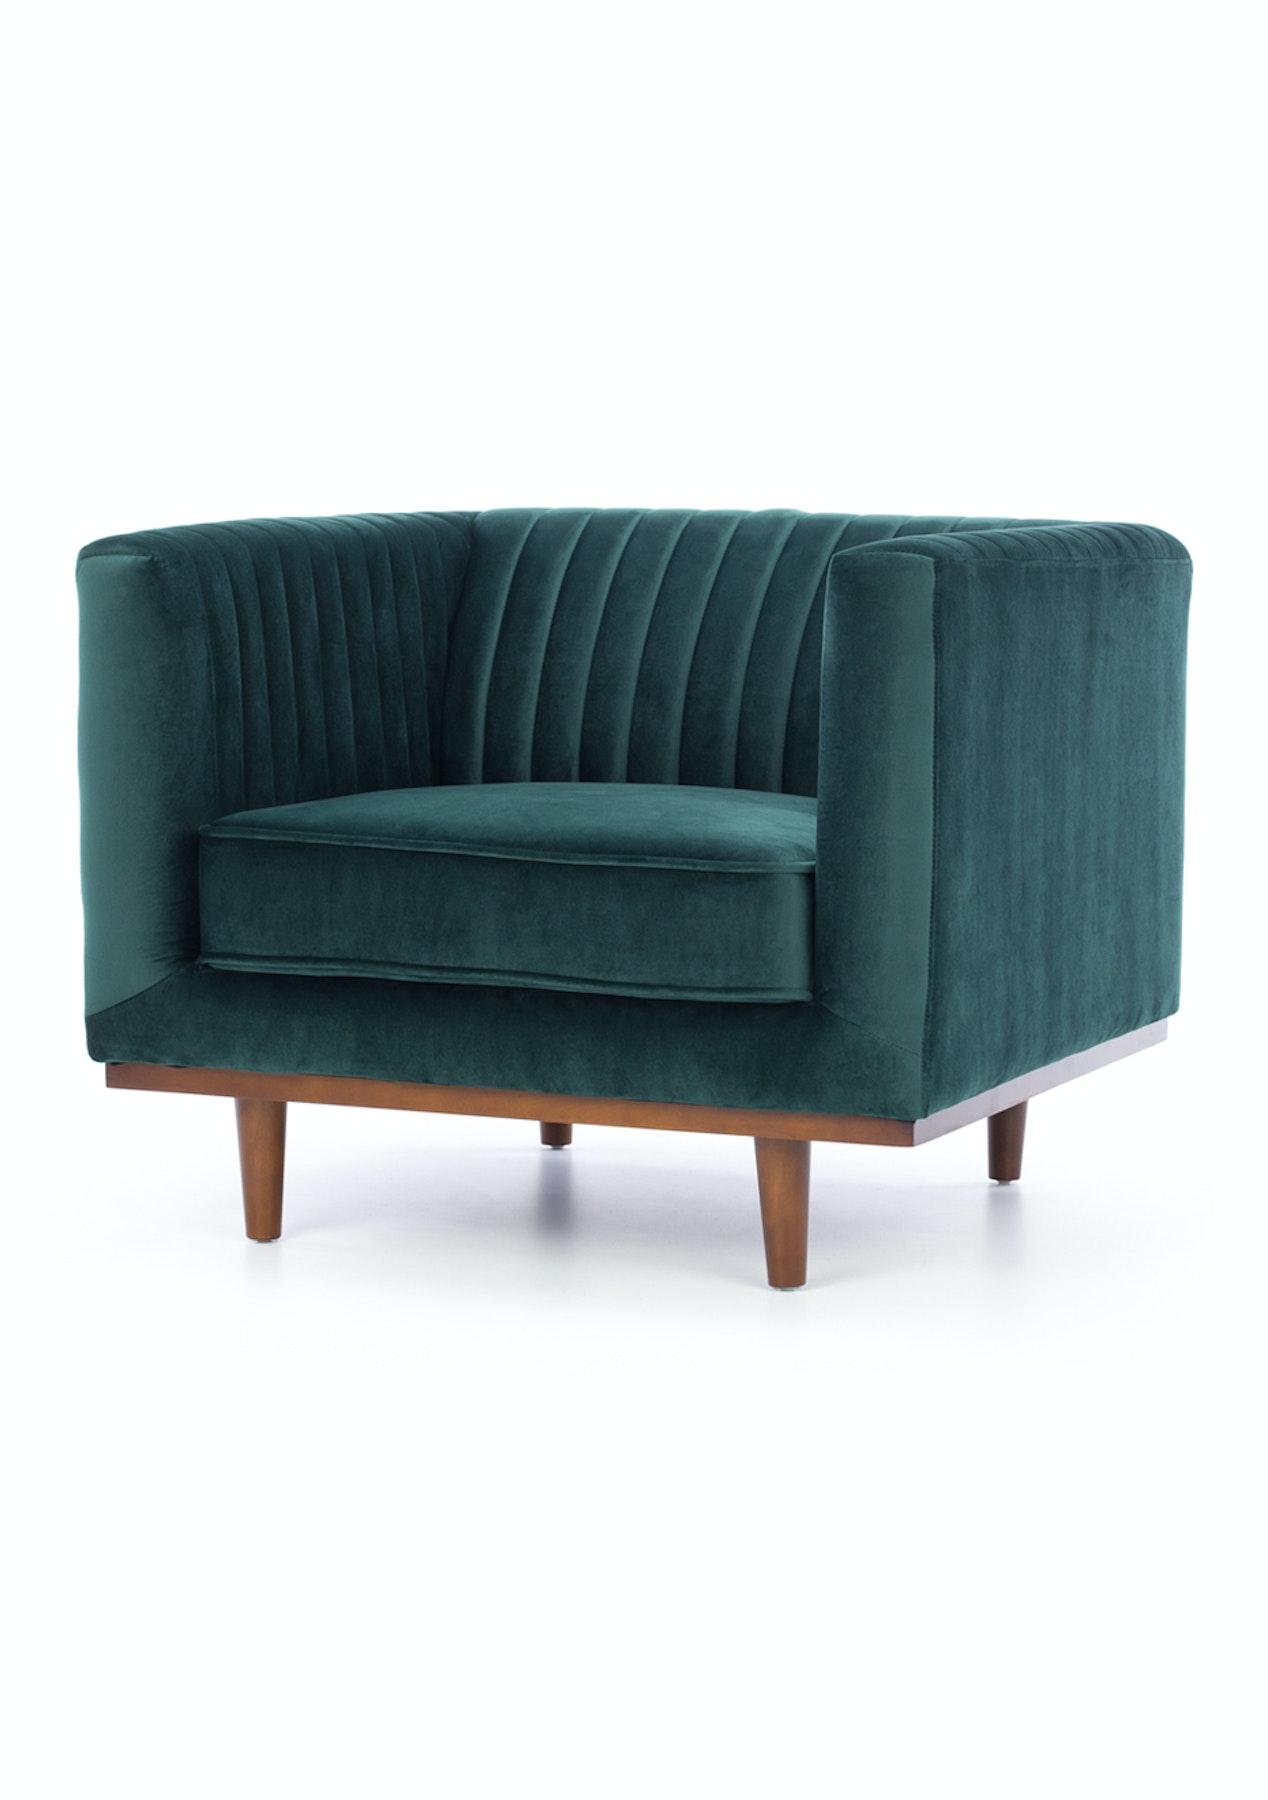 Furniture By Design Casey Armchair Dark Green Velvet